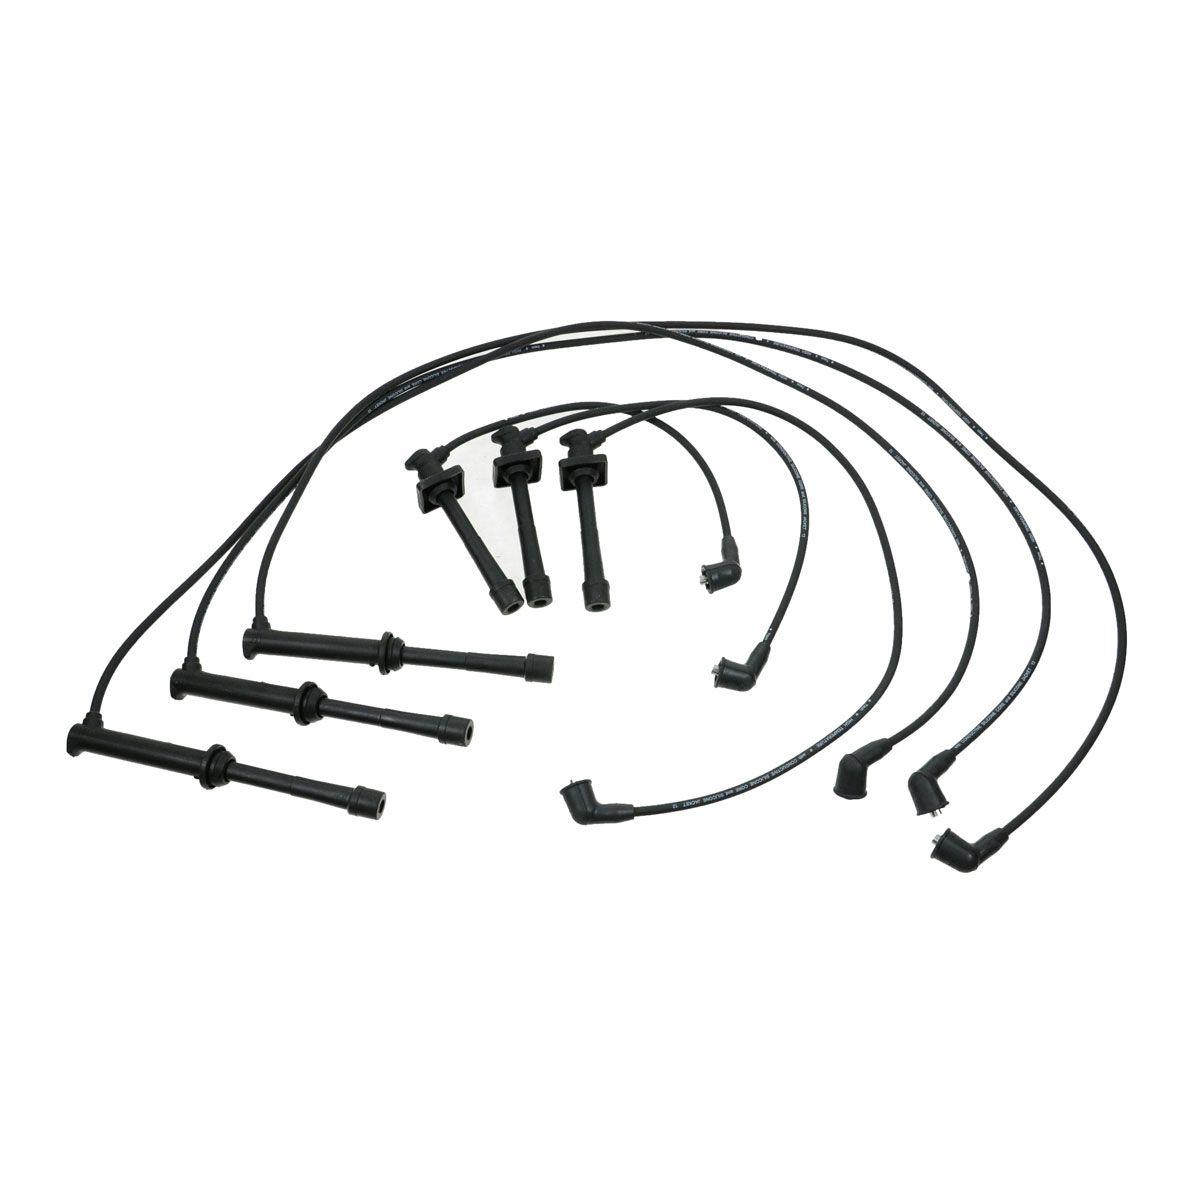 Ignition Spark Plug Wire Set Kit For Ford Probe Mazda 626 Millenia Mx6 Wiring Harness Mx 6 25